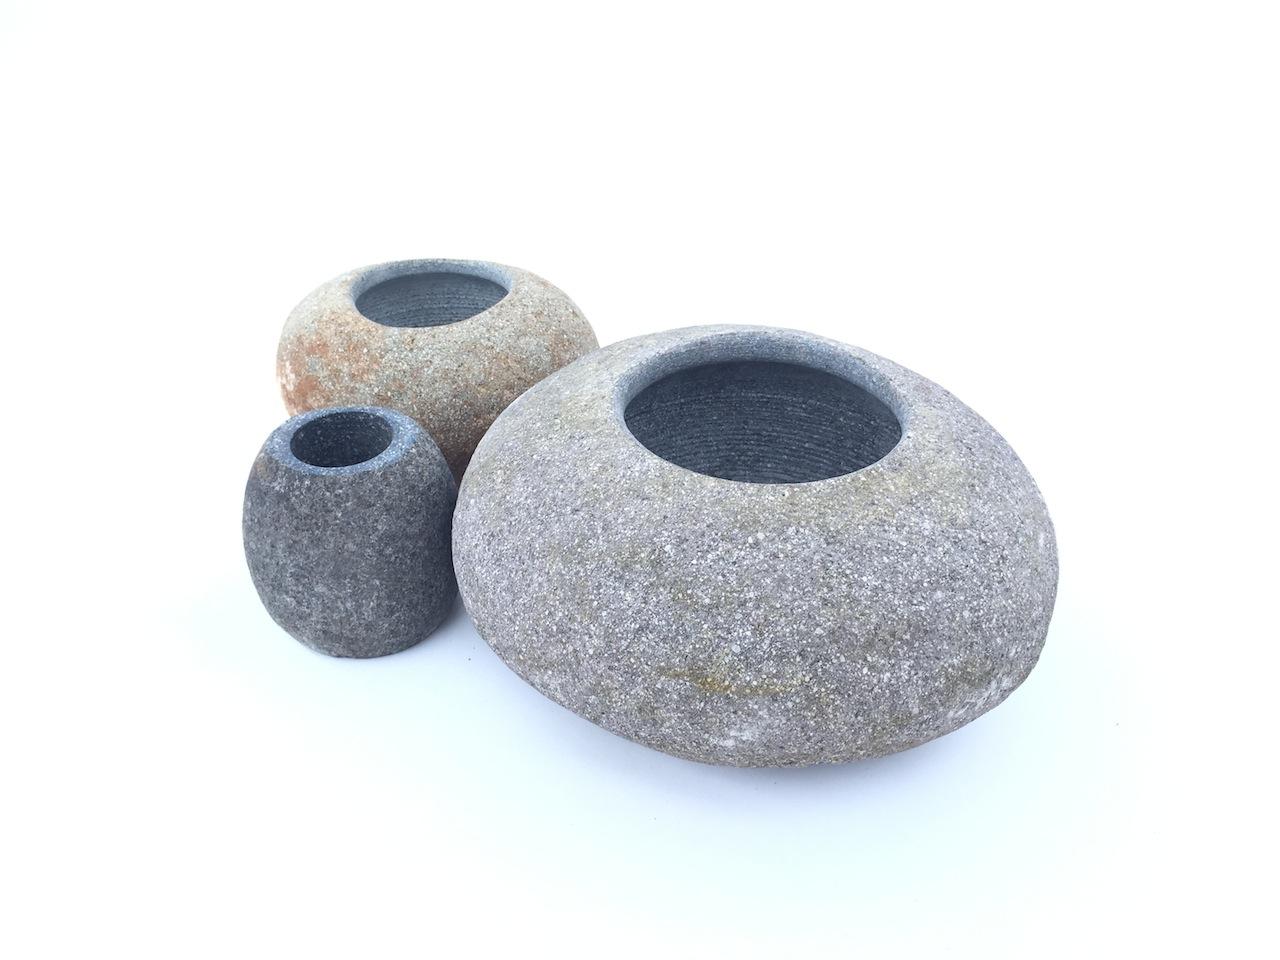 Riverstone Vessels